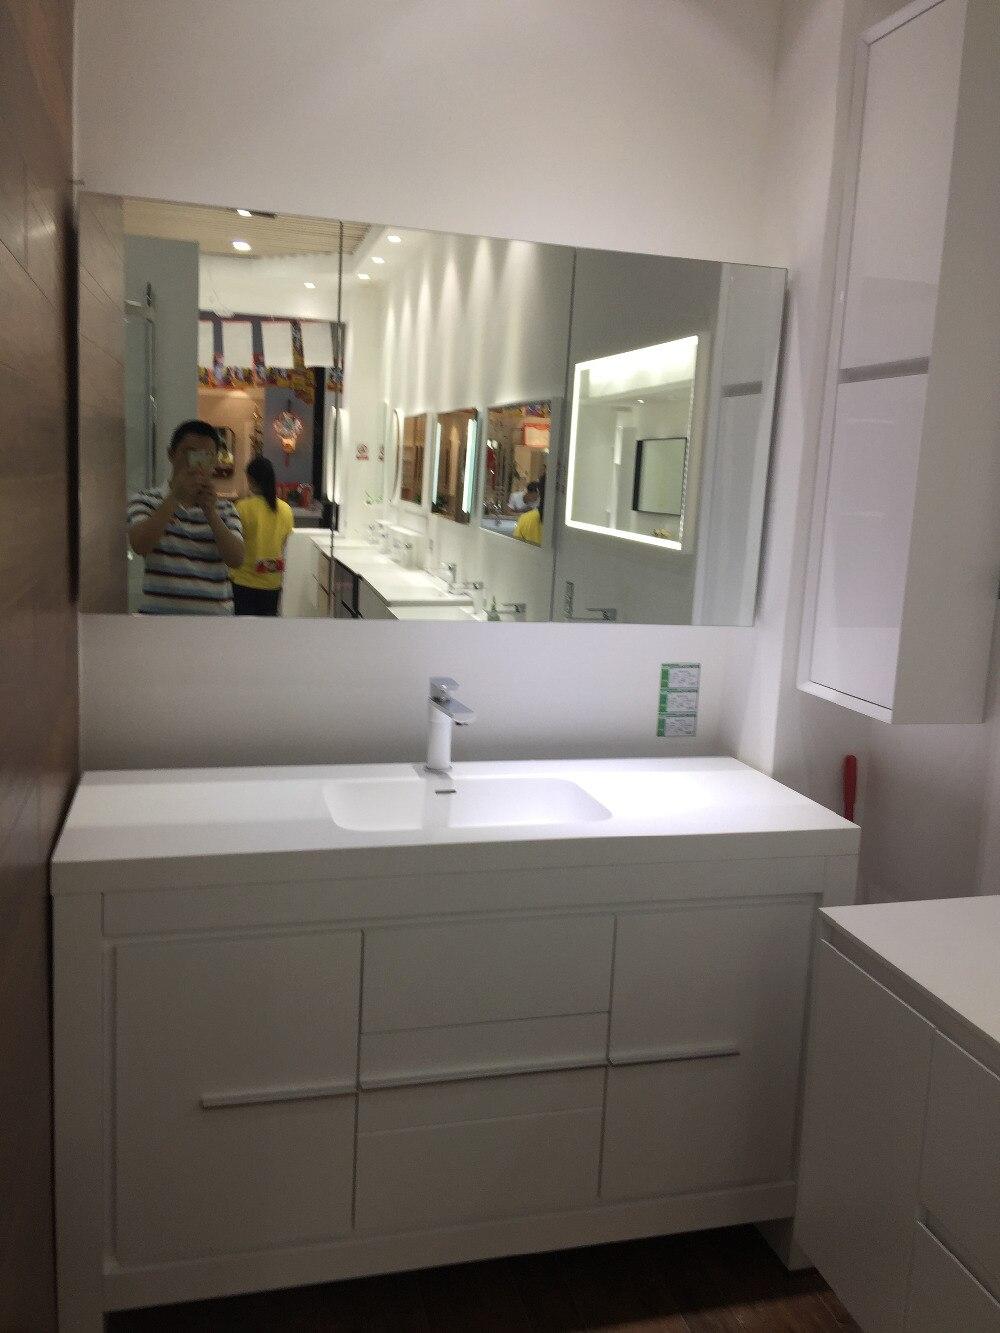 1300mm Floor Mounted Solid Surface Acrylic Furniture Oak Wooden Bathroom Vanity Cabinet Cloakroom Matt White Sink 2193 0